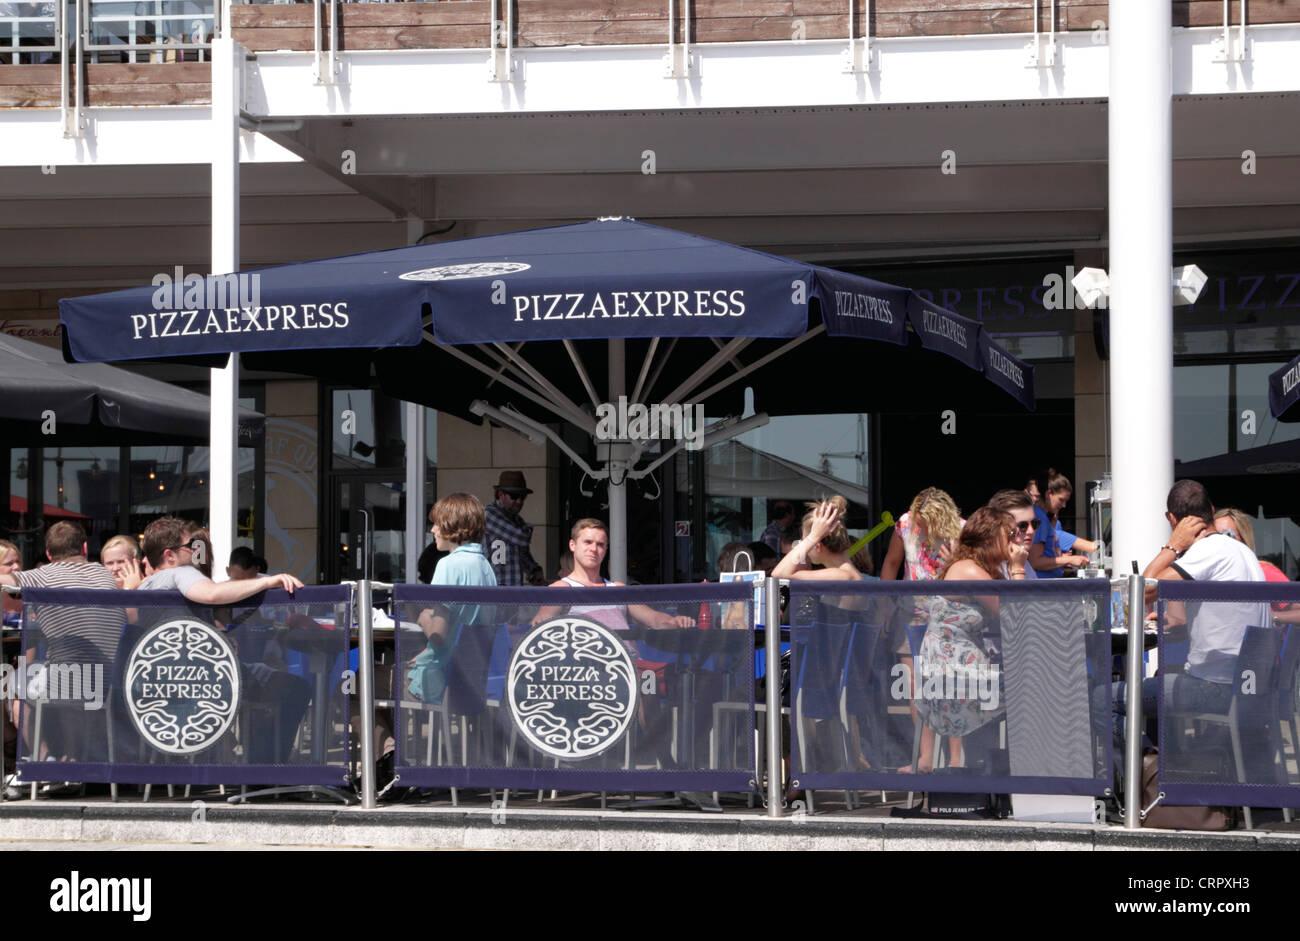 Pizza Express Restaurant Gunwharf Quays Portsmouth Stock